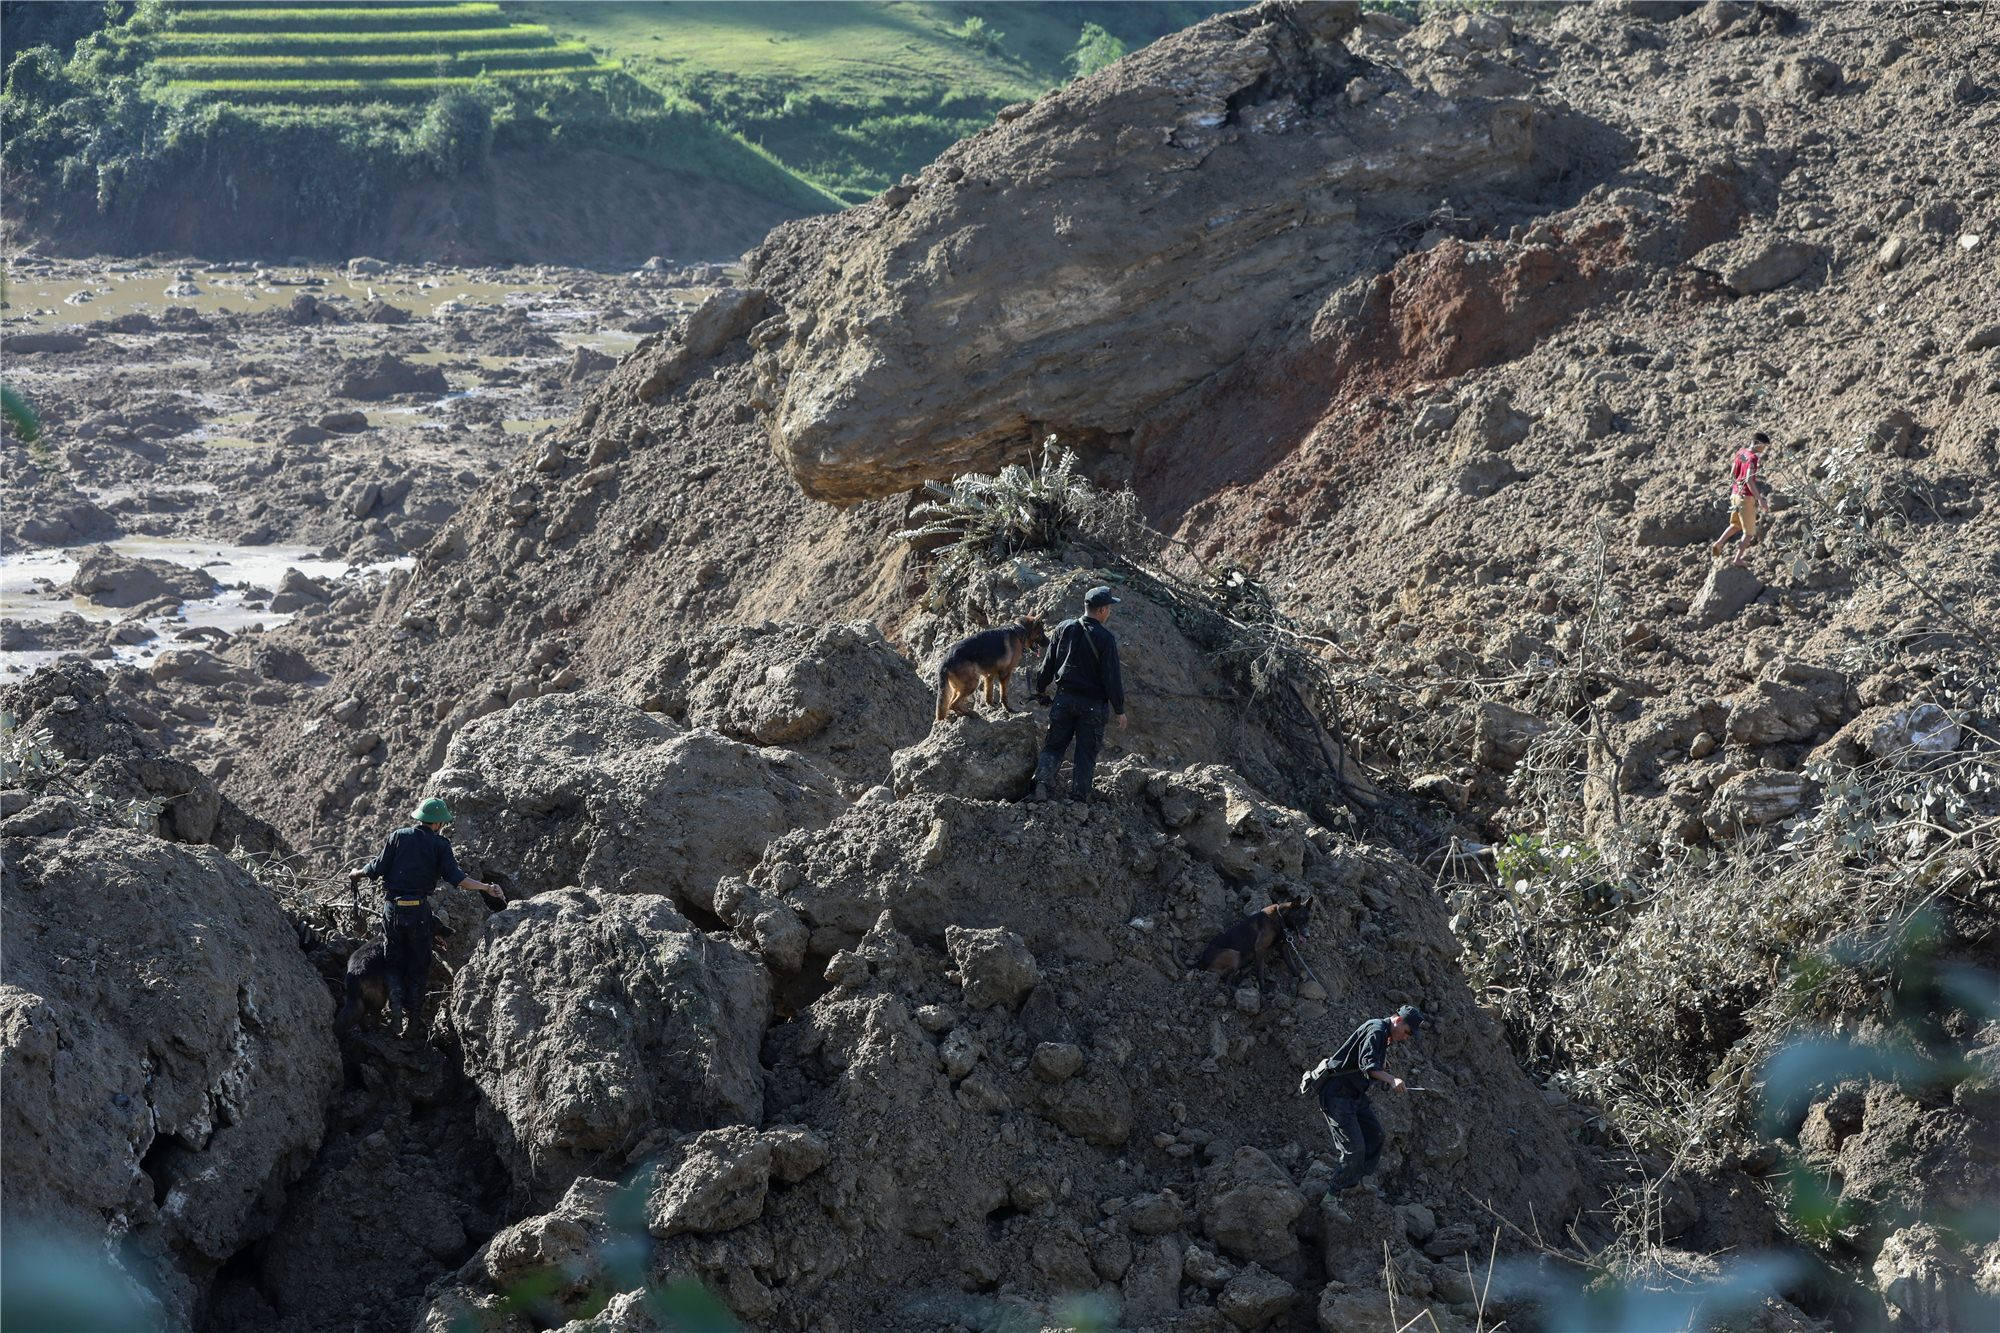 Landslide kills 4, injures 1 in northern Vietnam